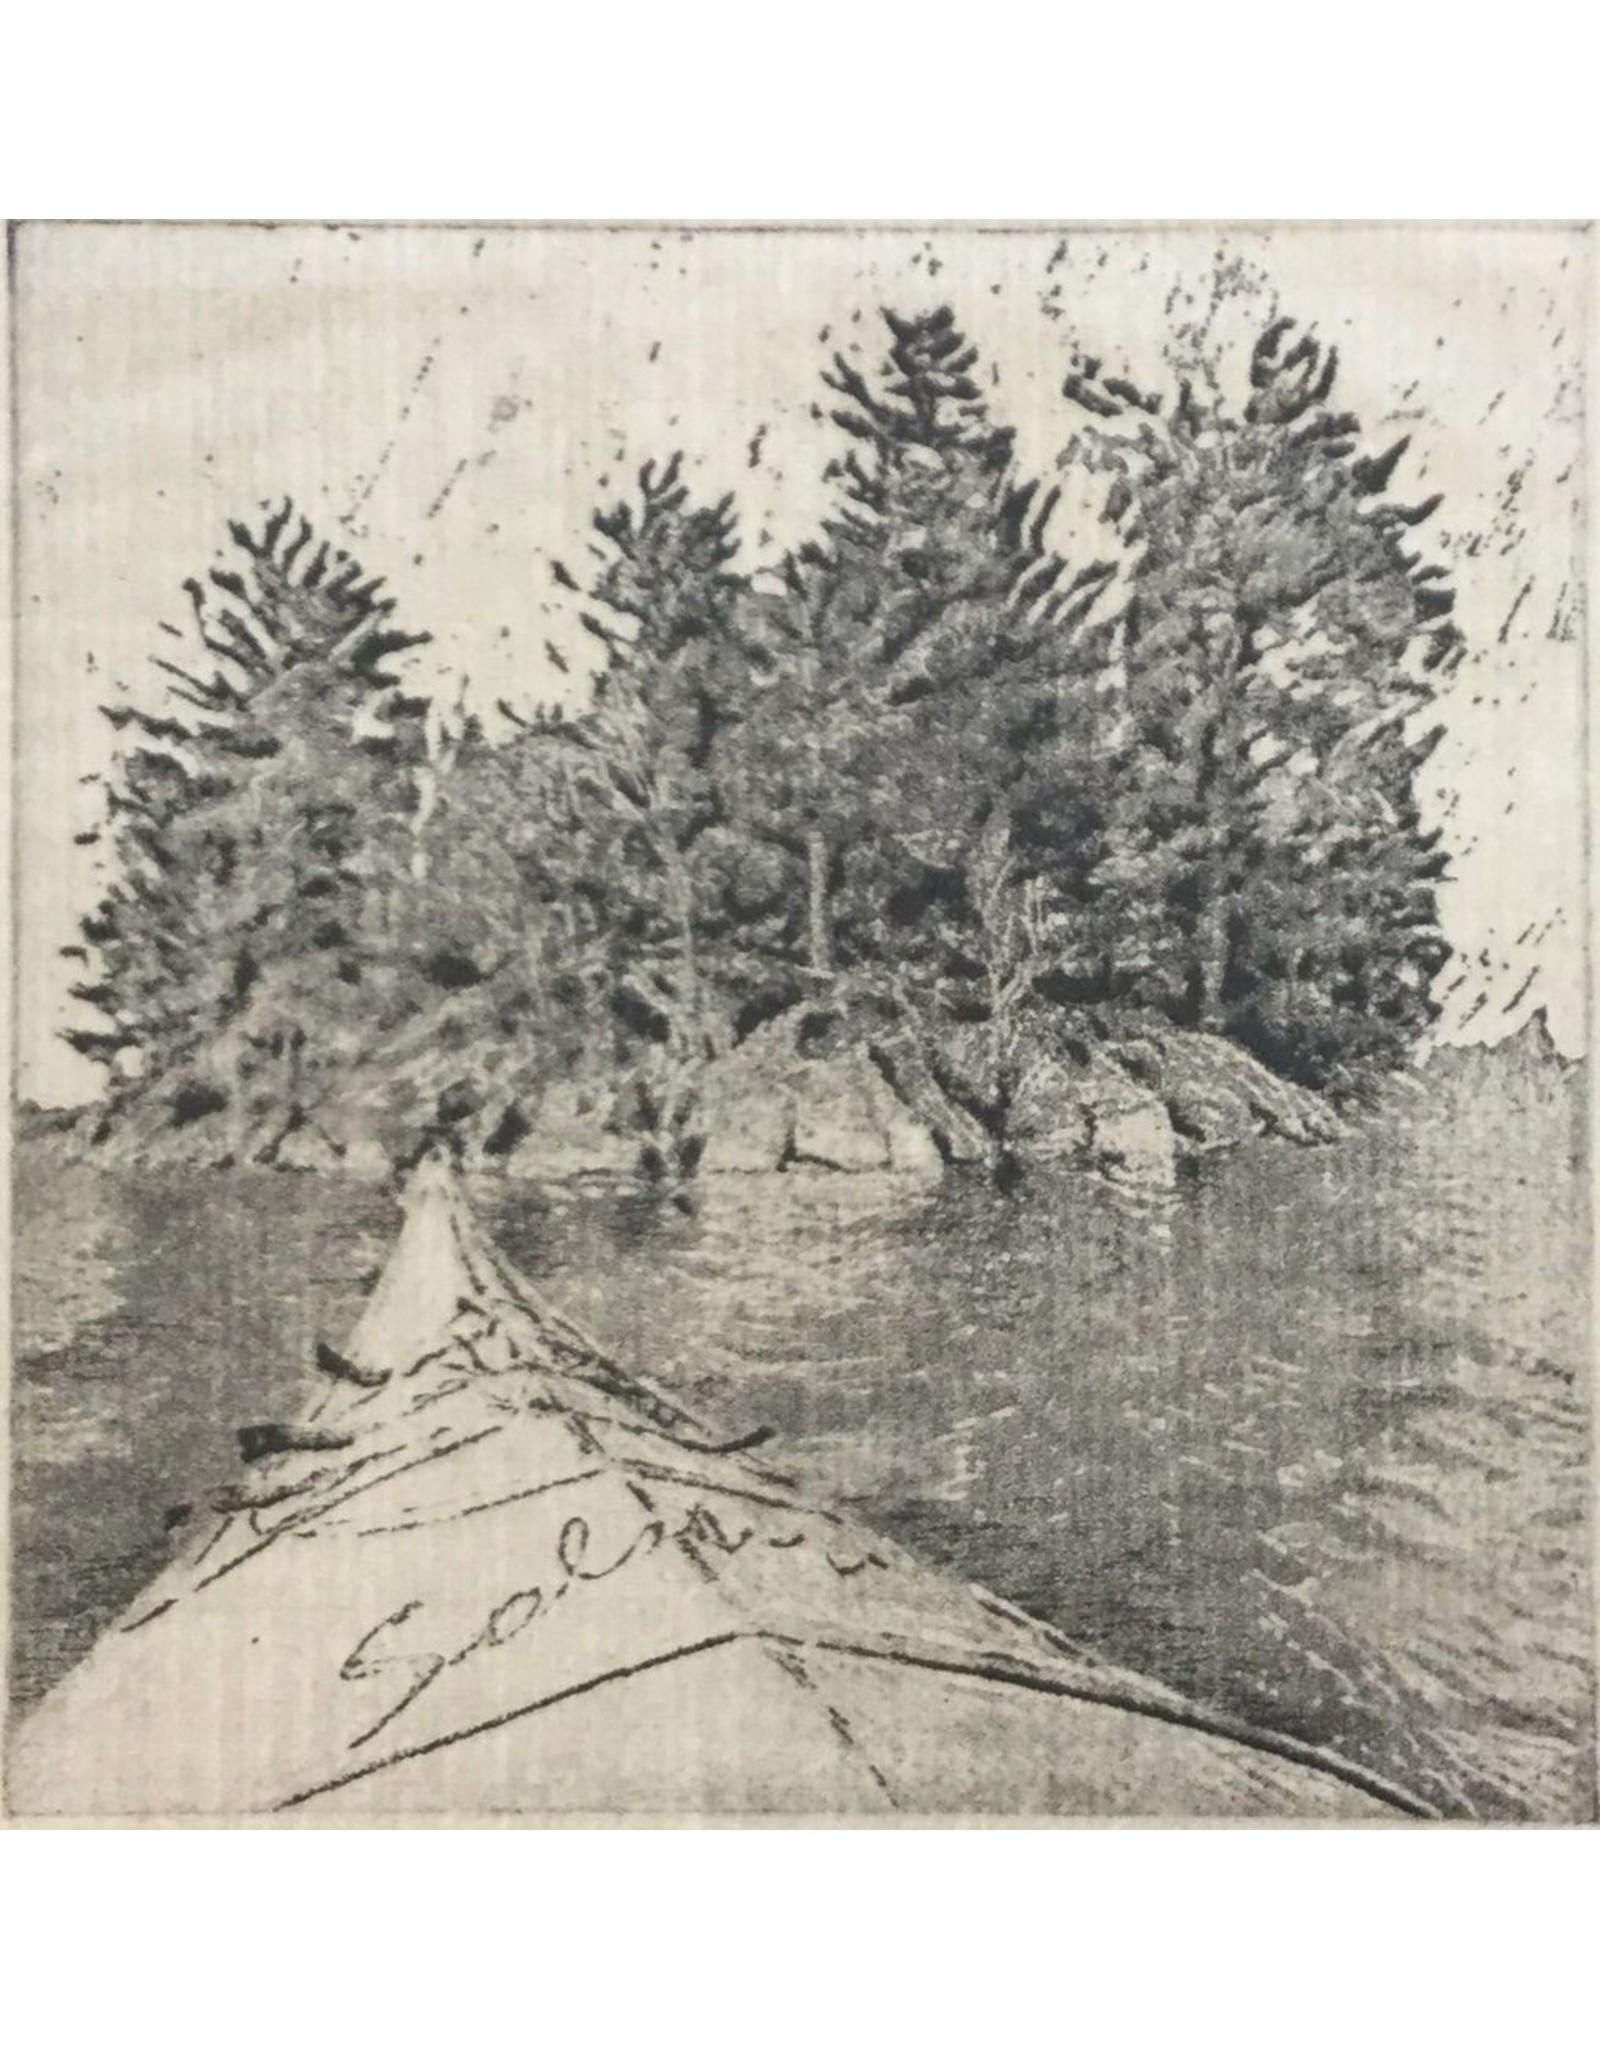 Graham, Peter Picnic Island, Peter Graham